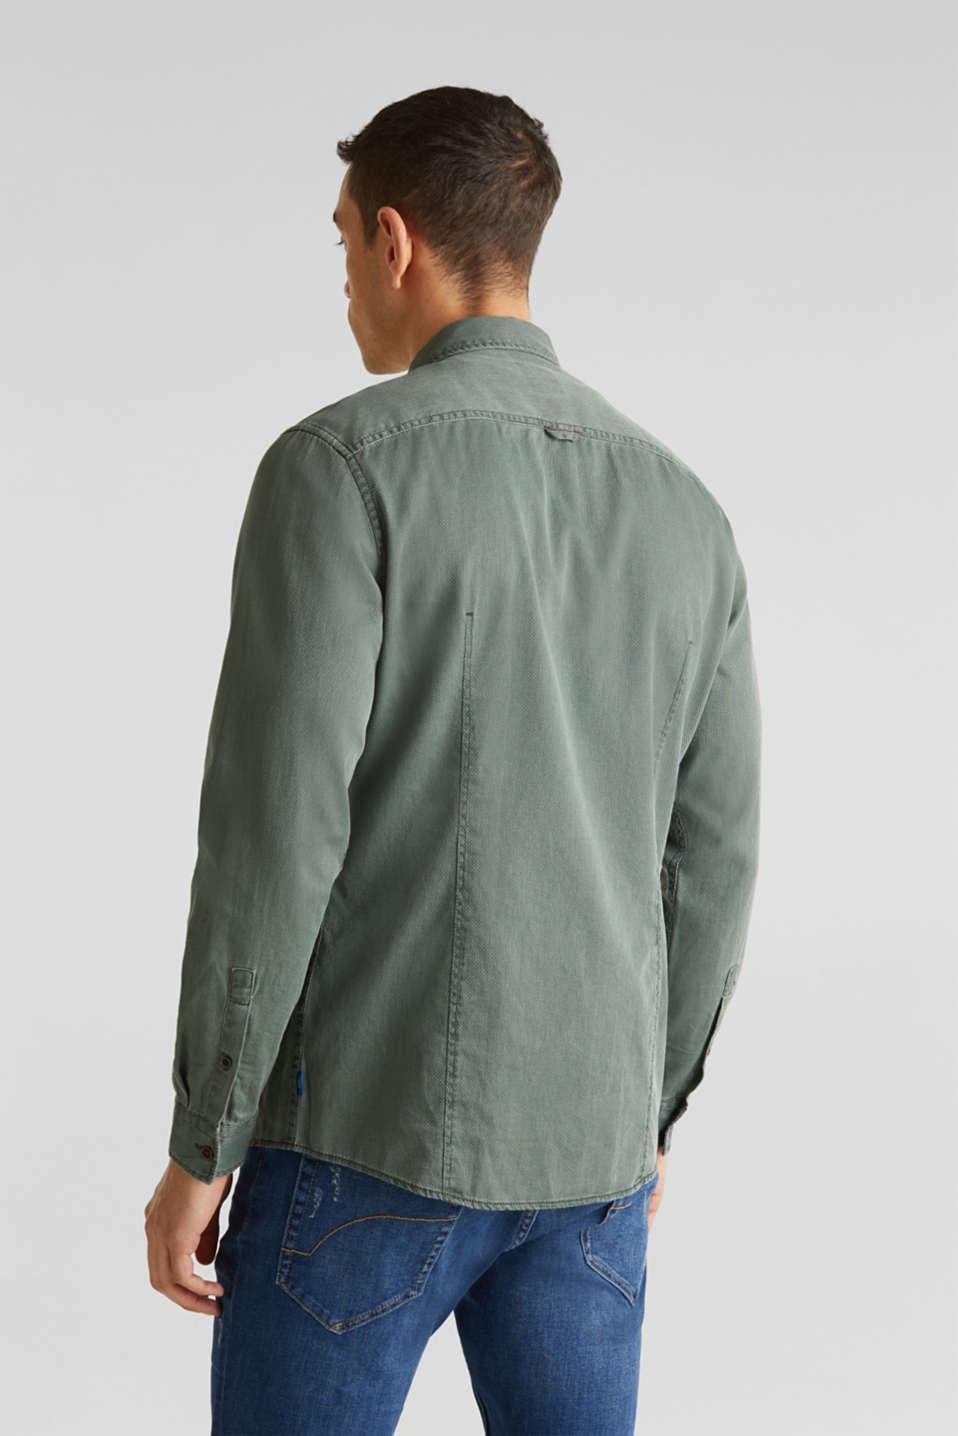 Shirts woven Slim fit, KHAKI GREEN 5, detail image number 3